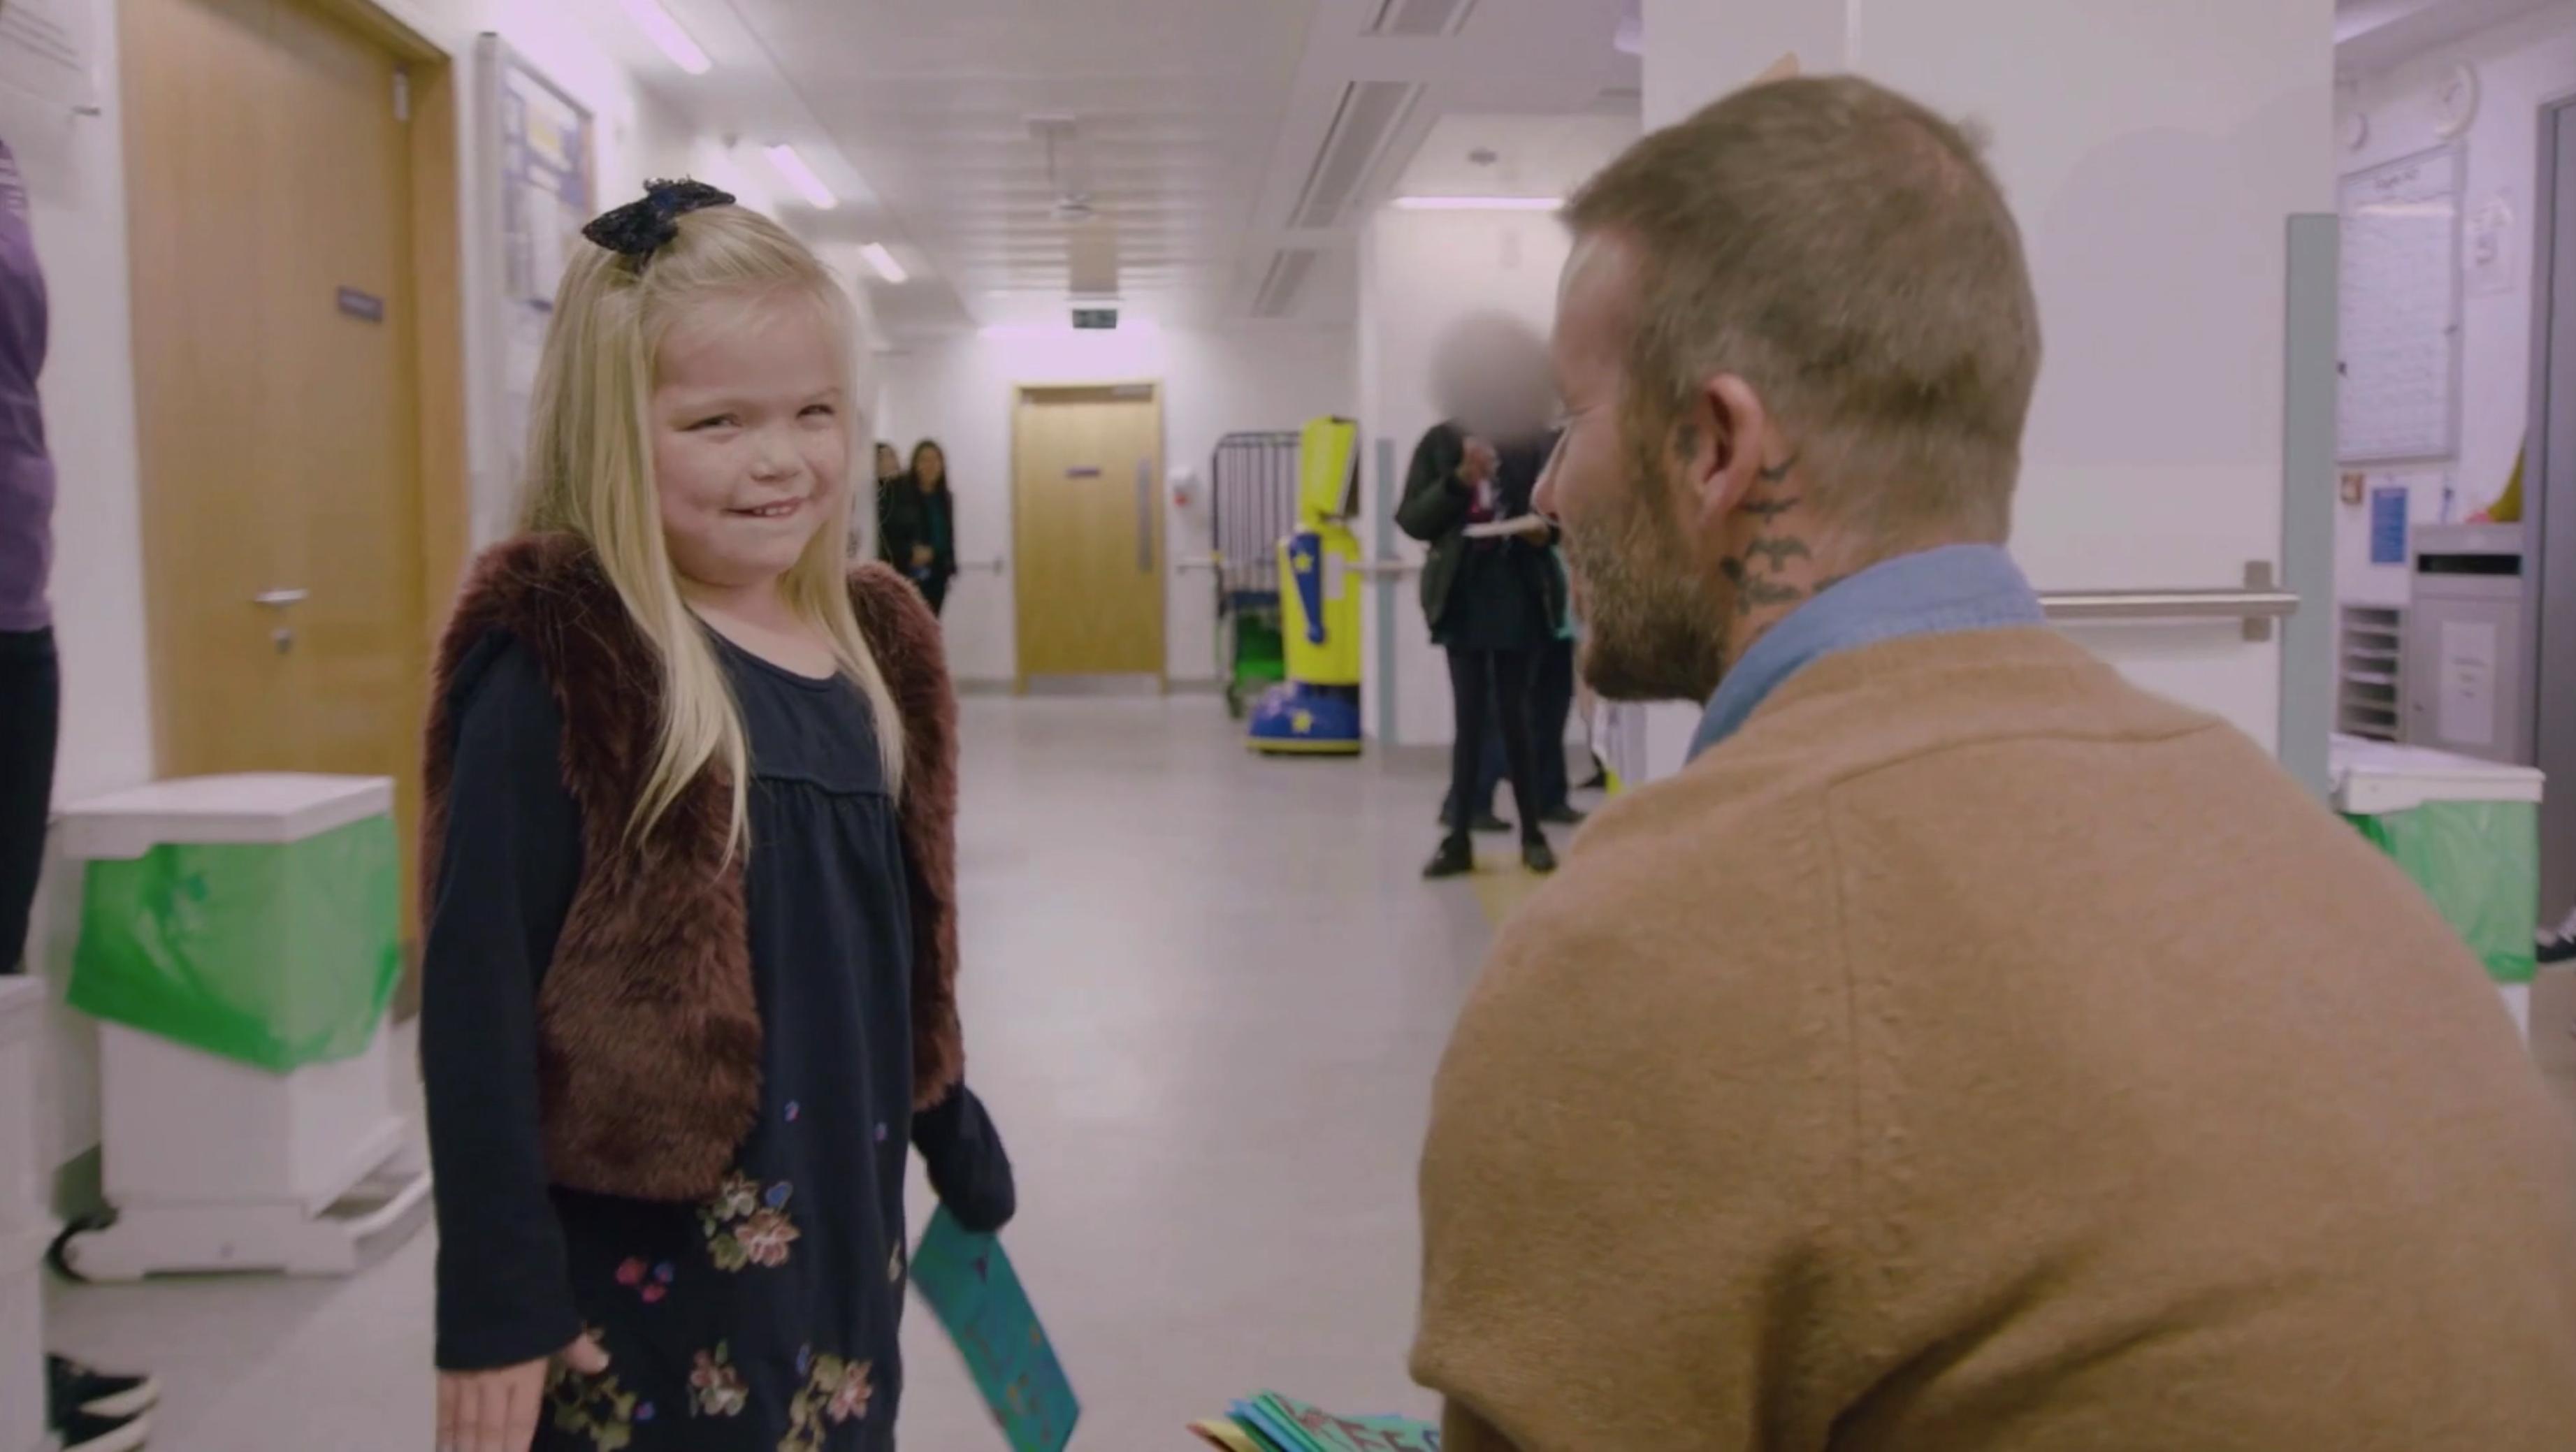 David Beckham Surprises 11-Year-Old Pride Of Britain Winner In Children's Hospital